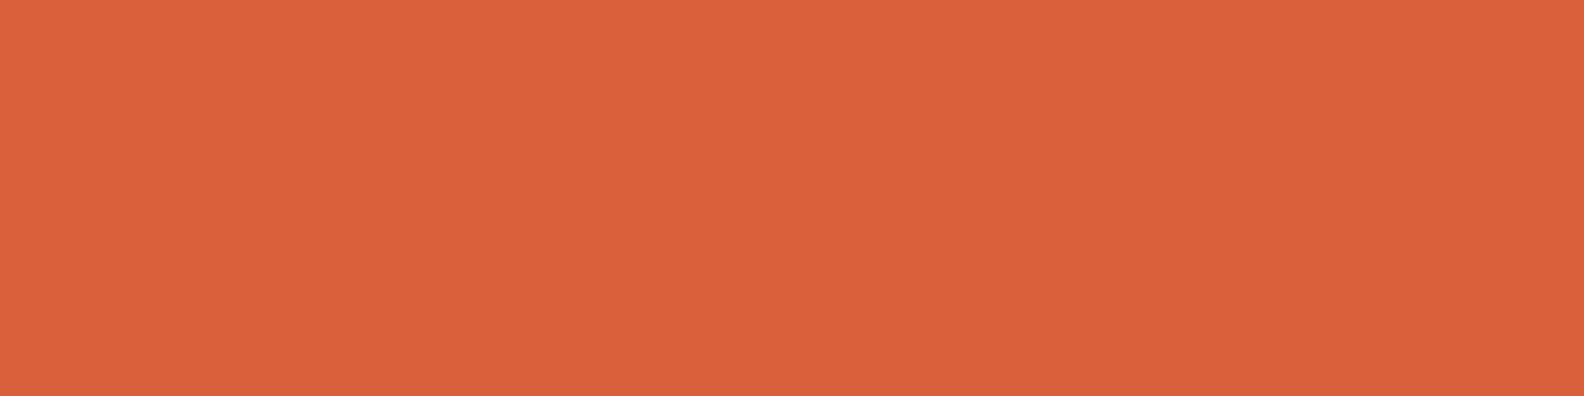 1584x396 Medium Vermilion Solid Color Background